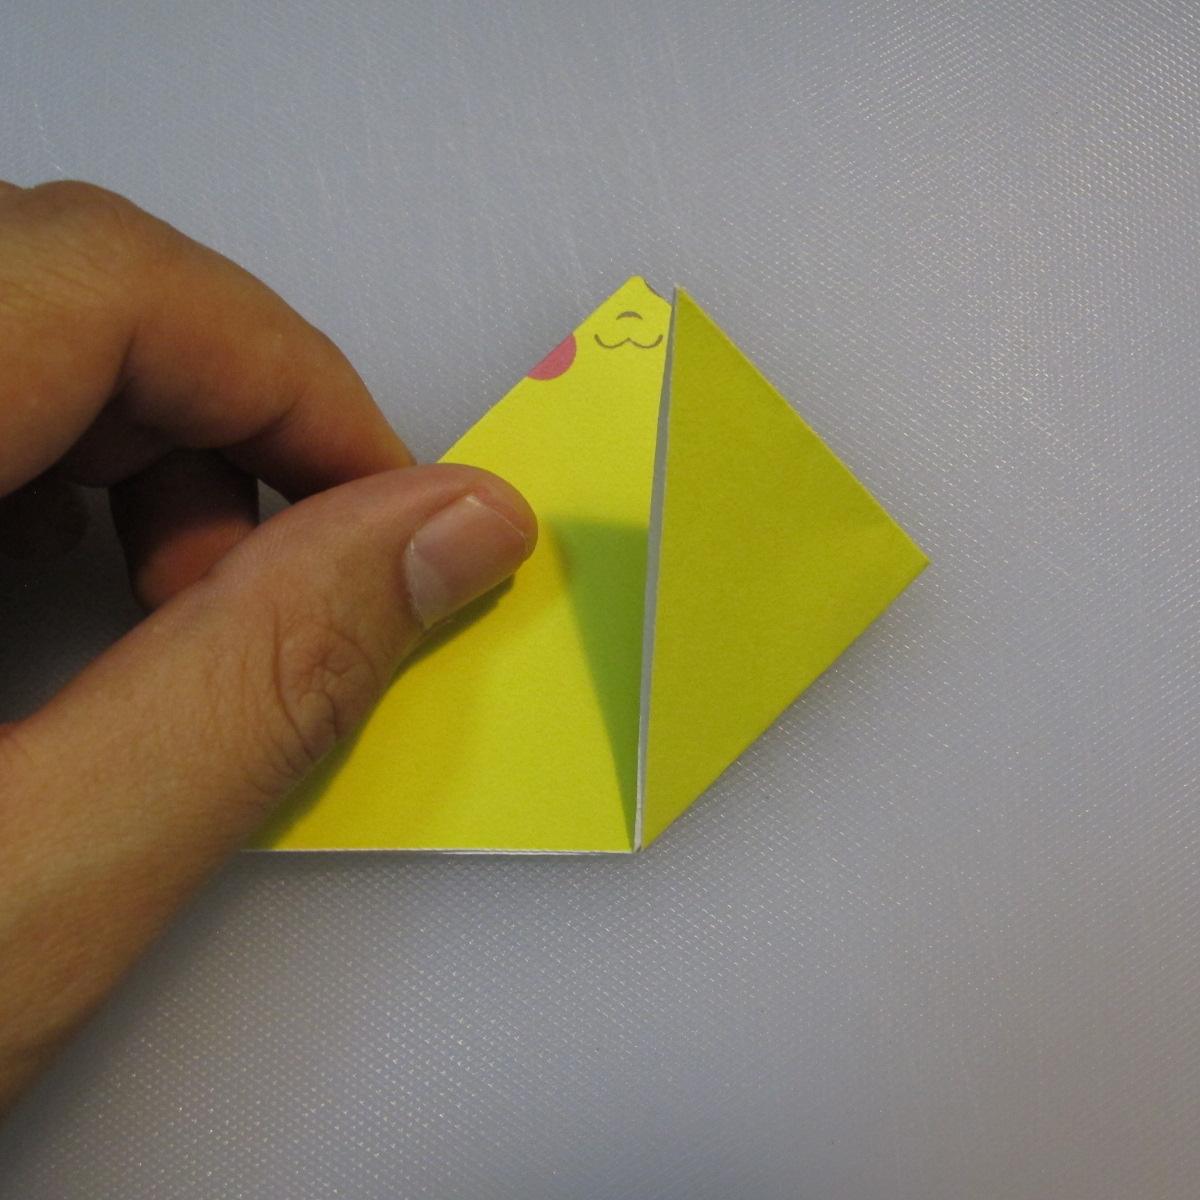 mookeep-วิธีพับกระดาษเป็นรูปปิกาจู-01-009